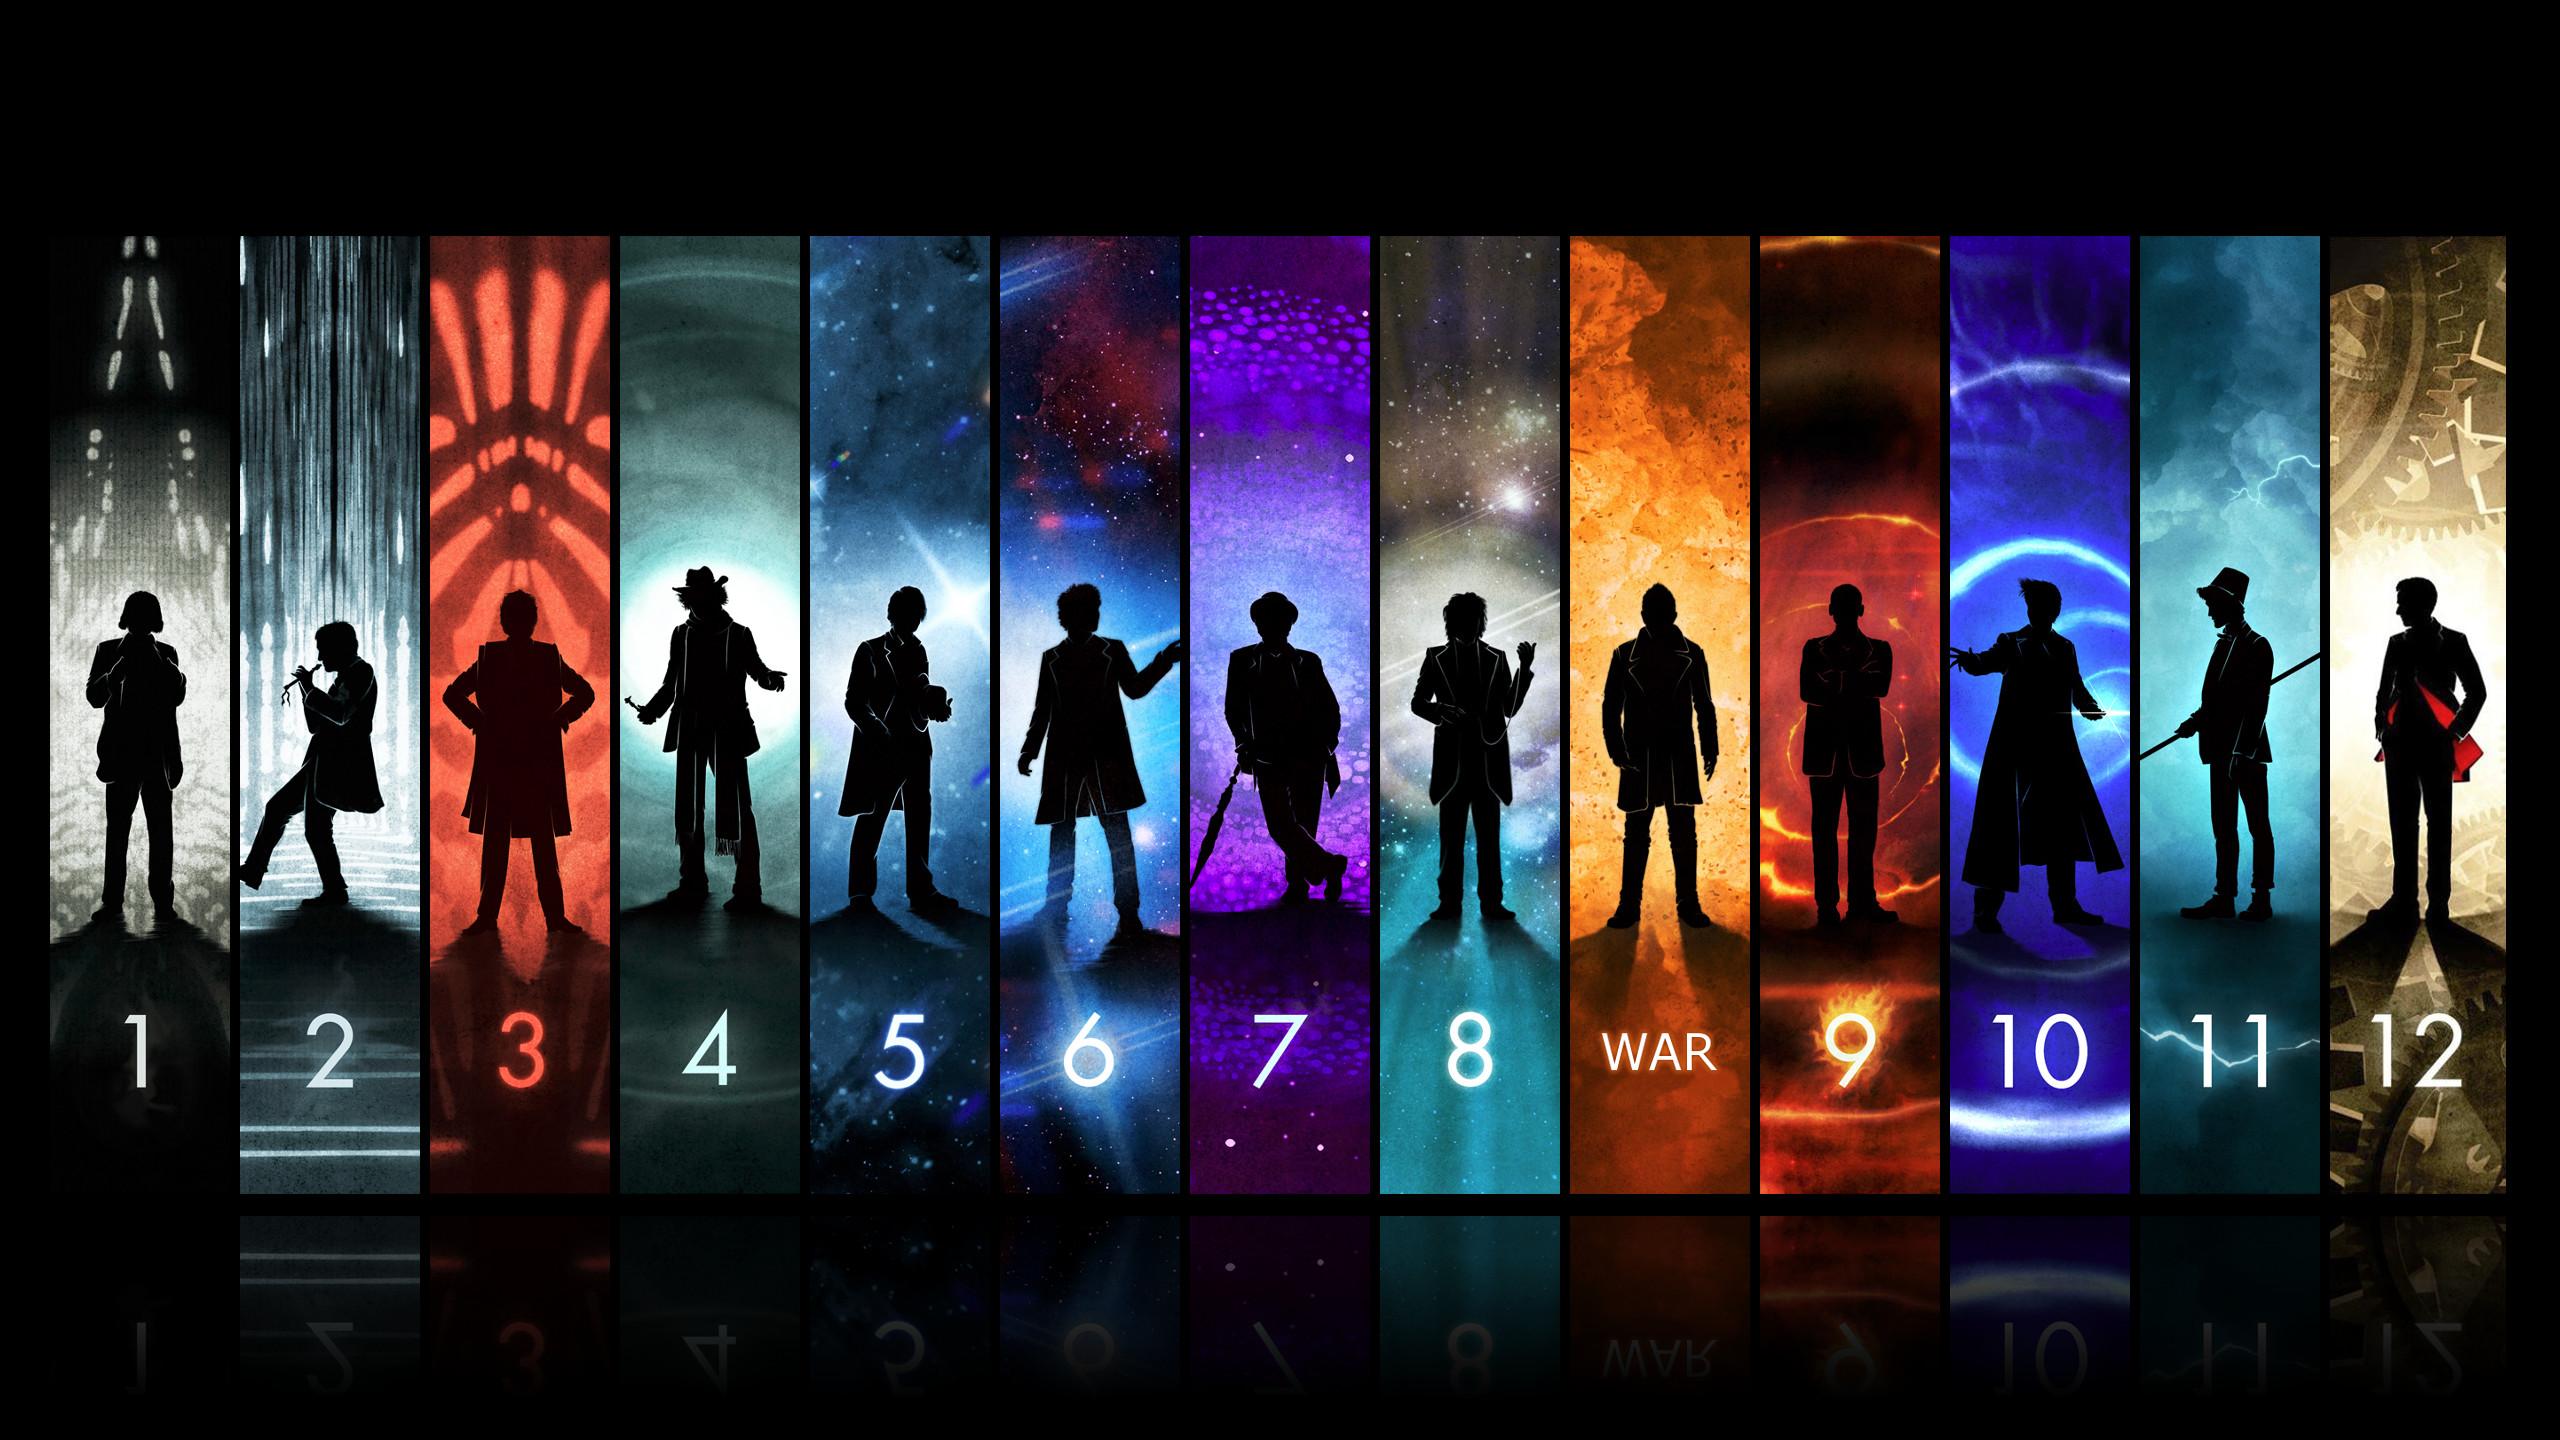 Doctor Who Wallpaper dump